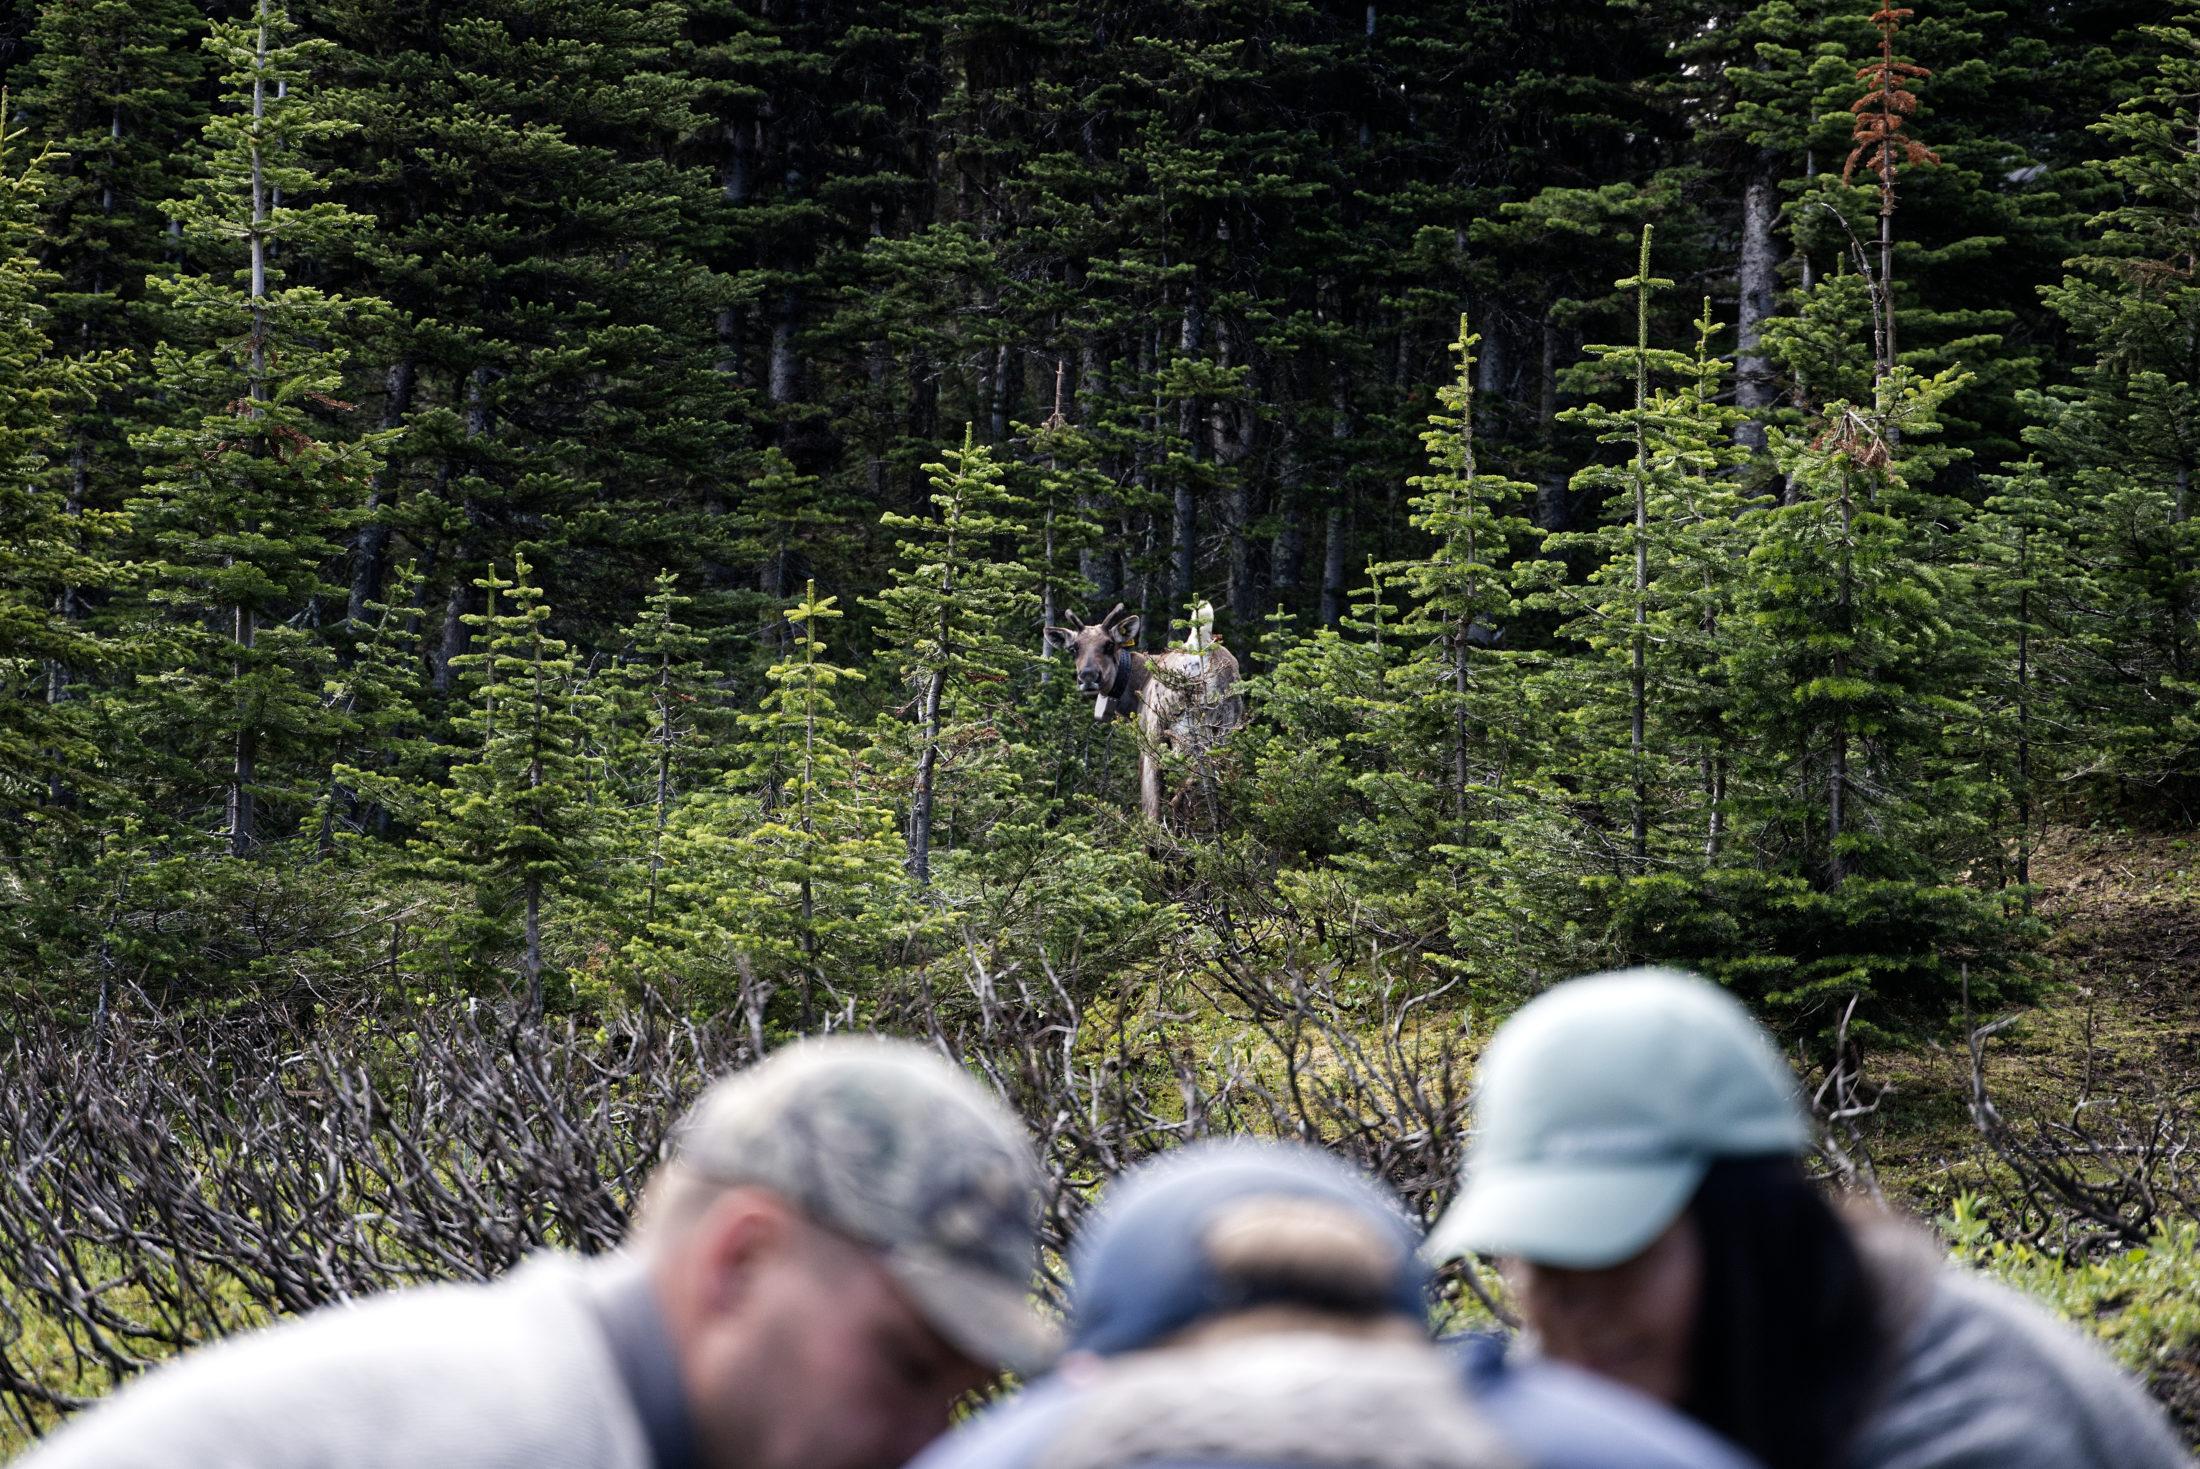 caribou mother Klinse-za herd pen